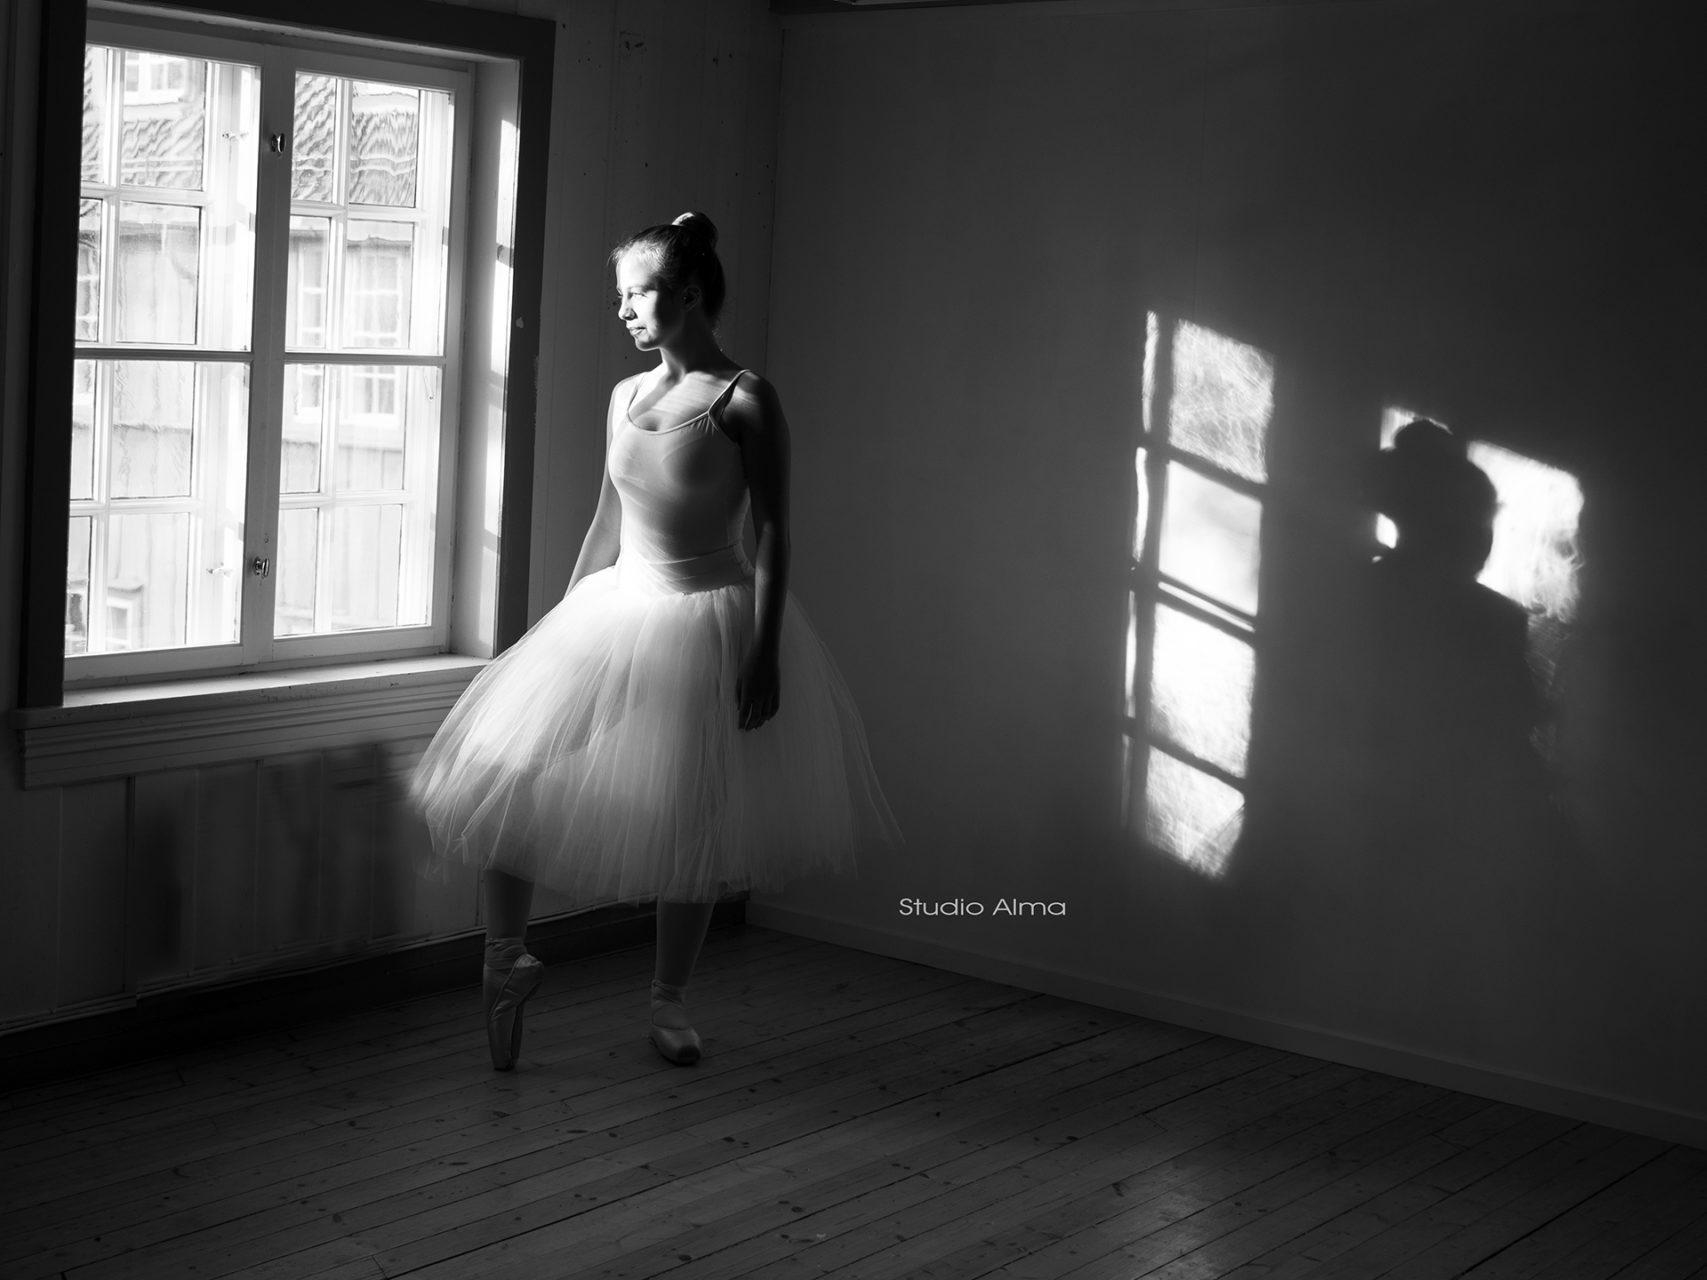 konfirmant-ballettdanser-fotograf-studioalma